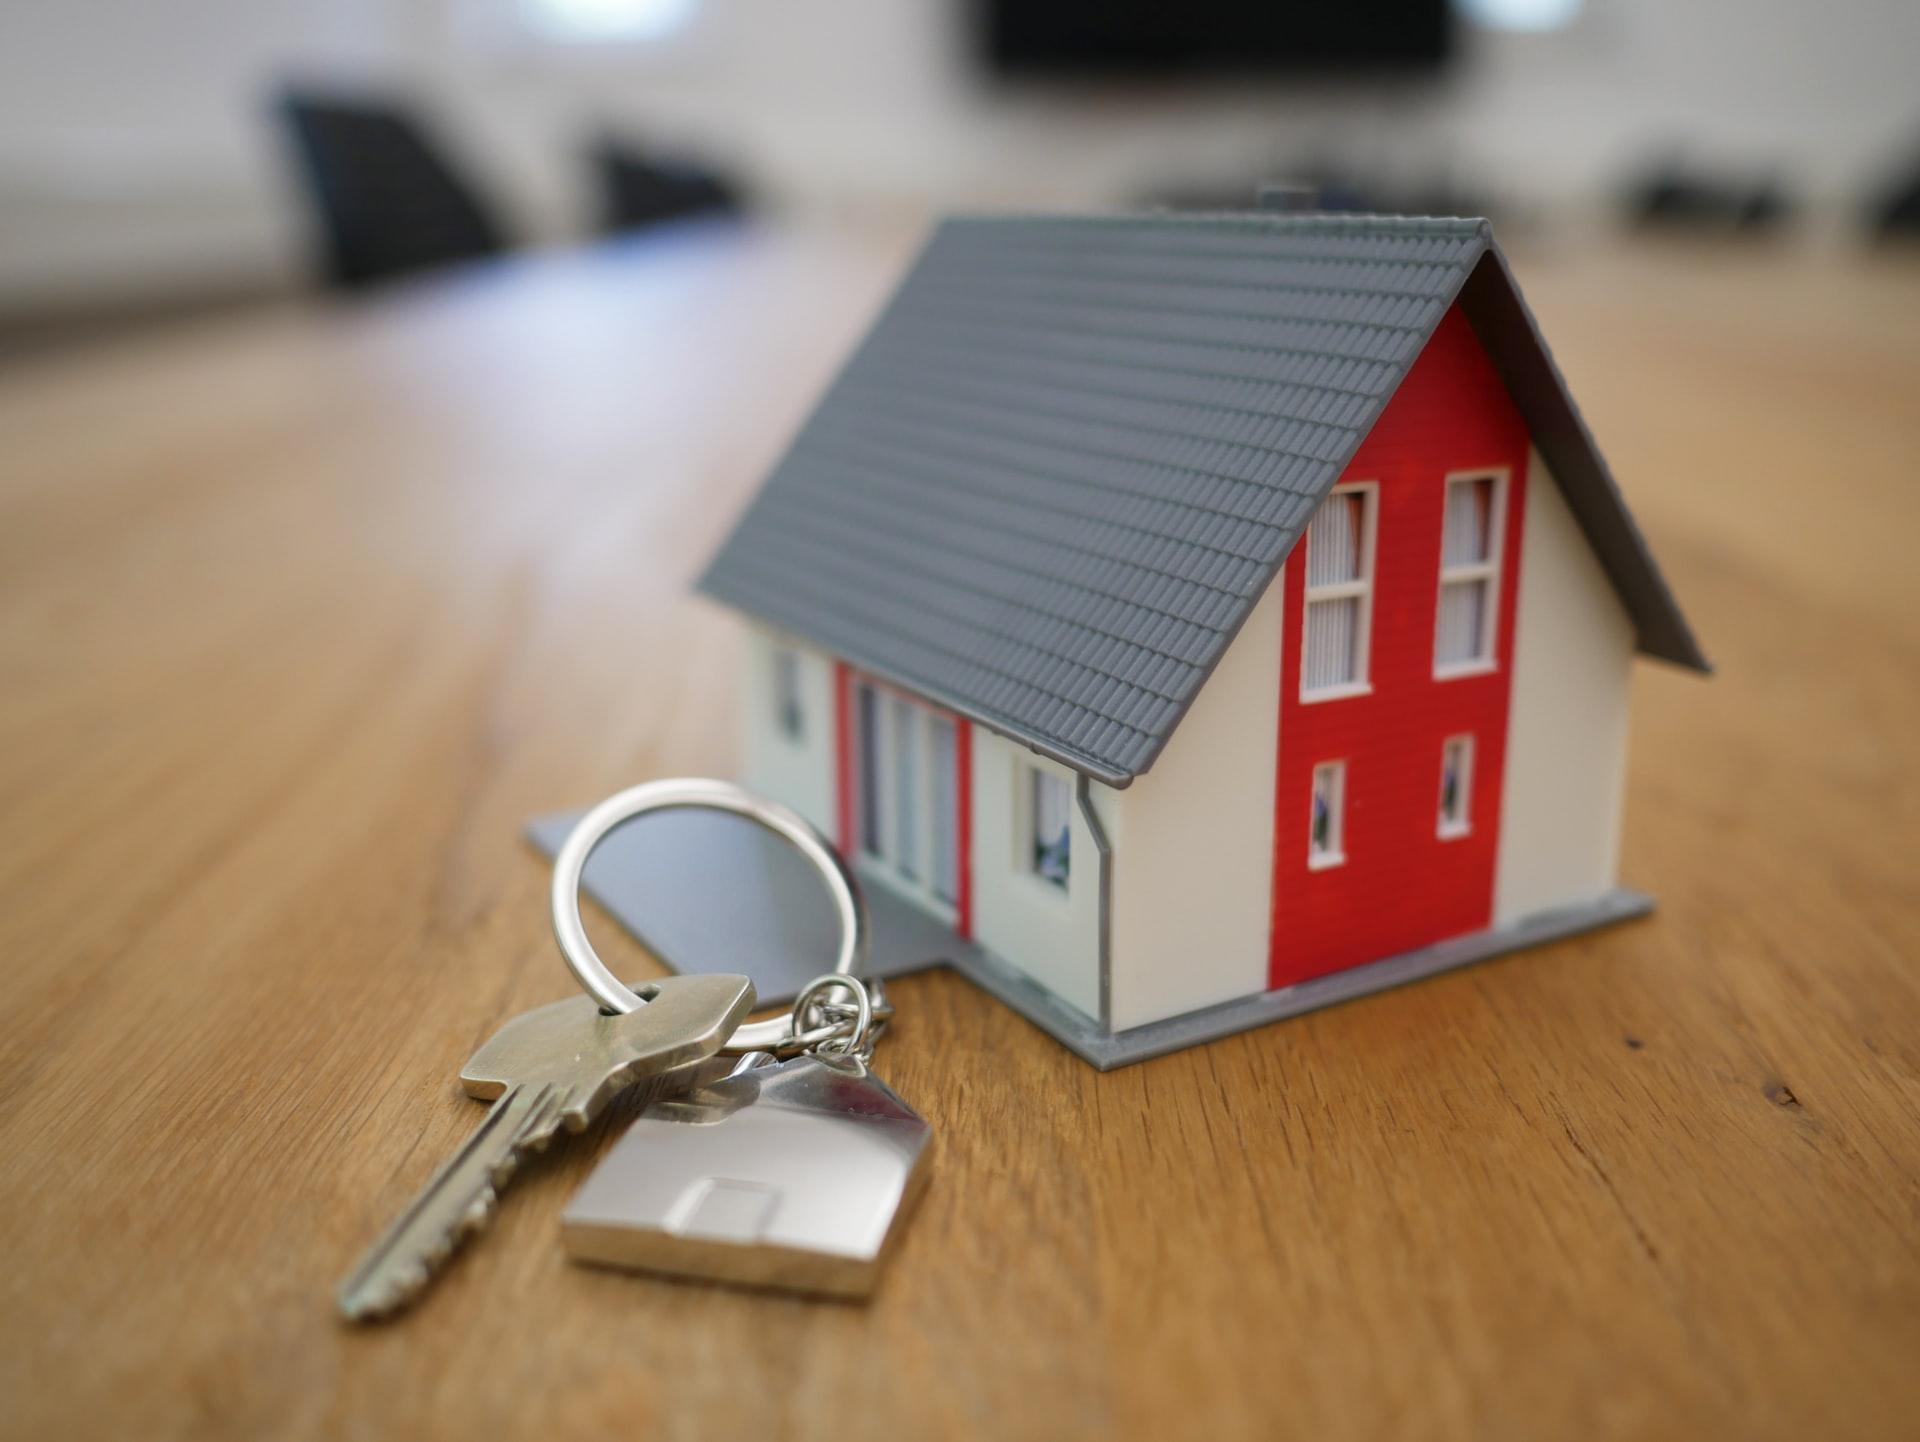 Macheta unei case asezata pe o masa, iar langa aceasta se afla cheia de la intrare, in marime naturala